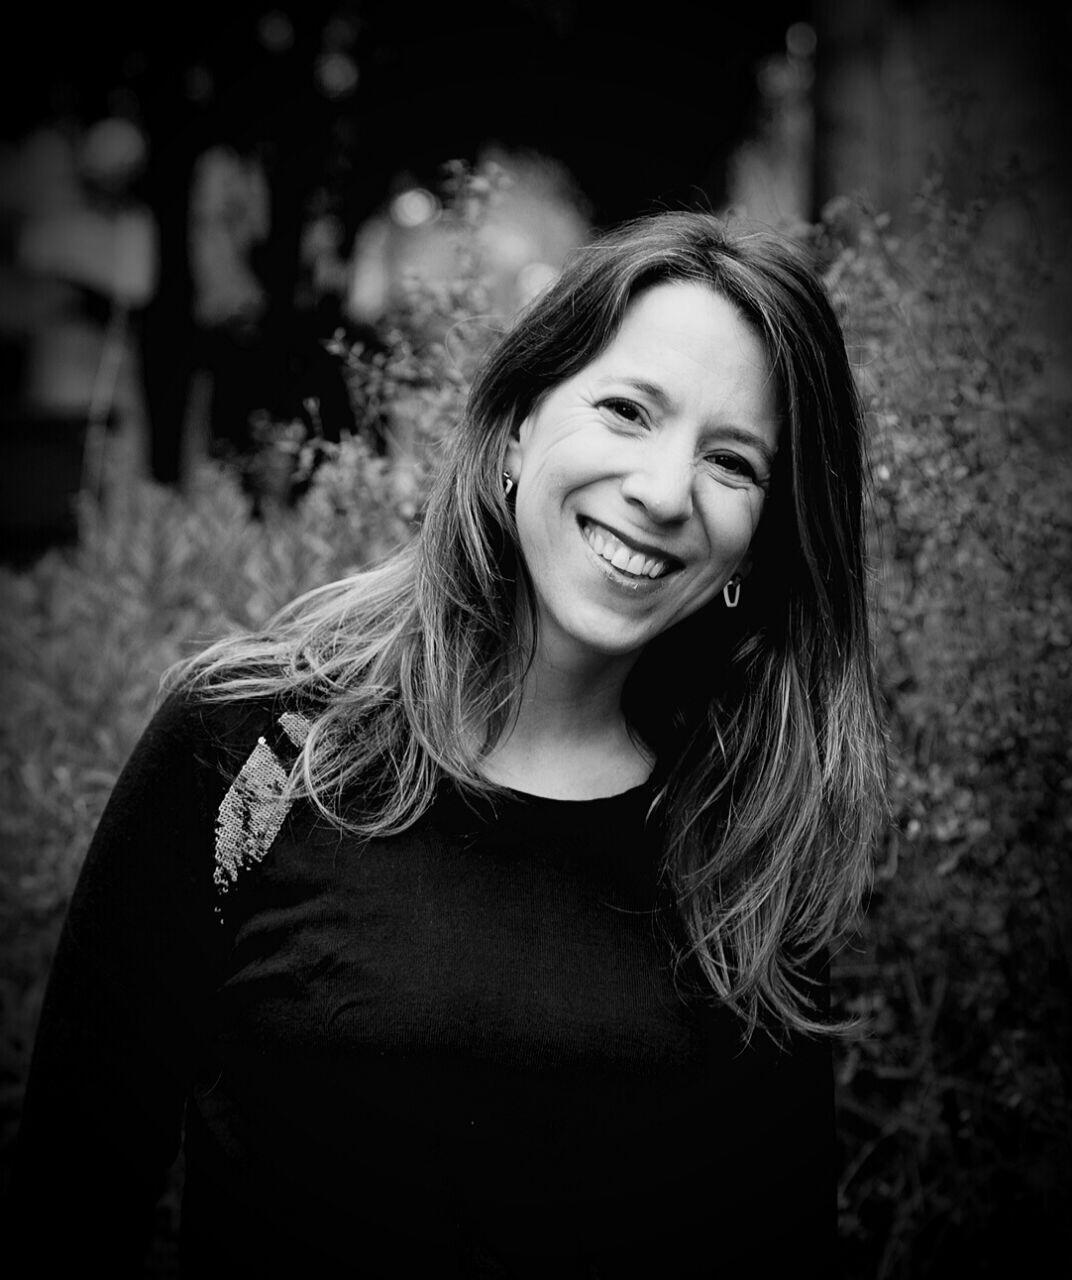 30 Dafna Barenboim, piano, foto 2